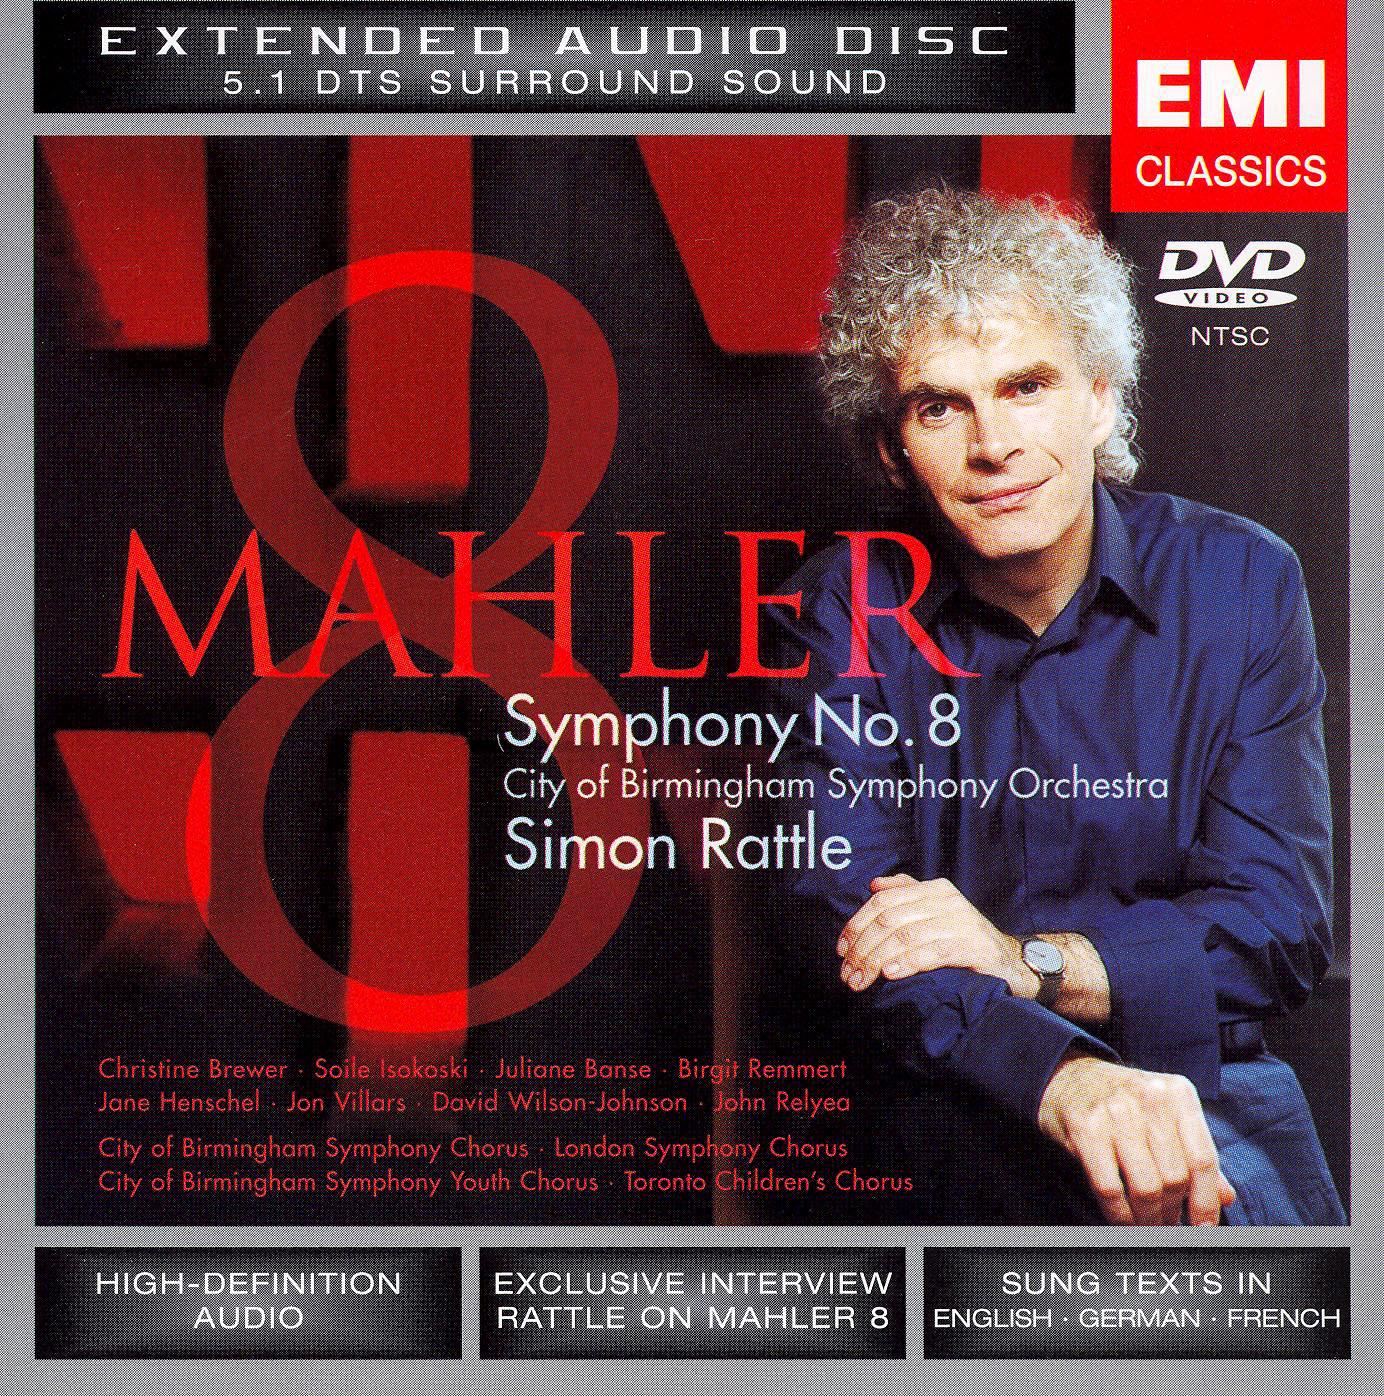 Simon Rattle: Mahler - Symphony No. 8